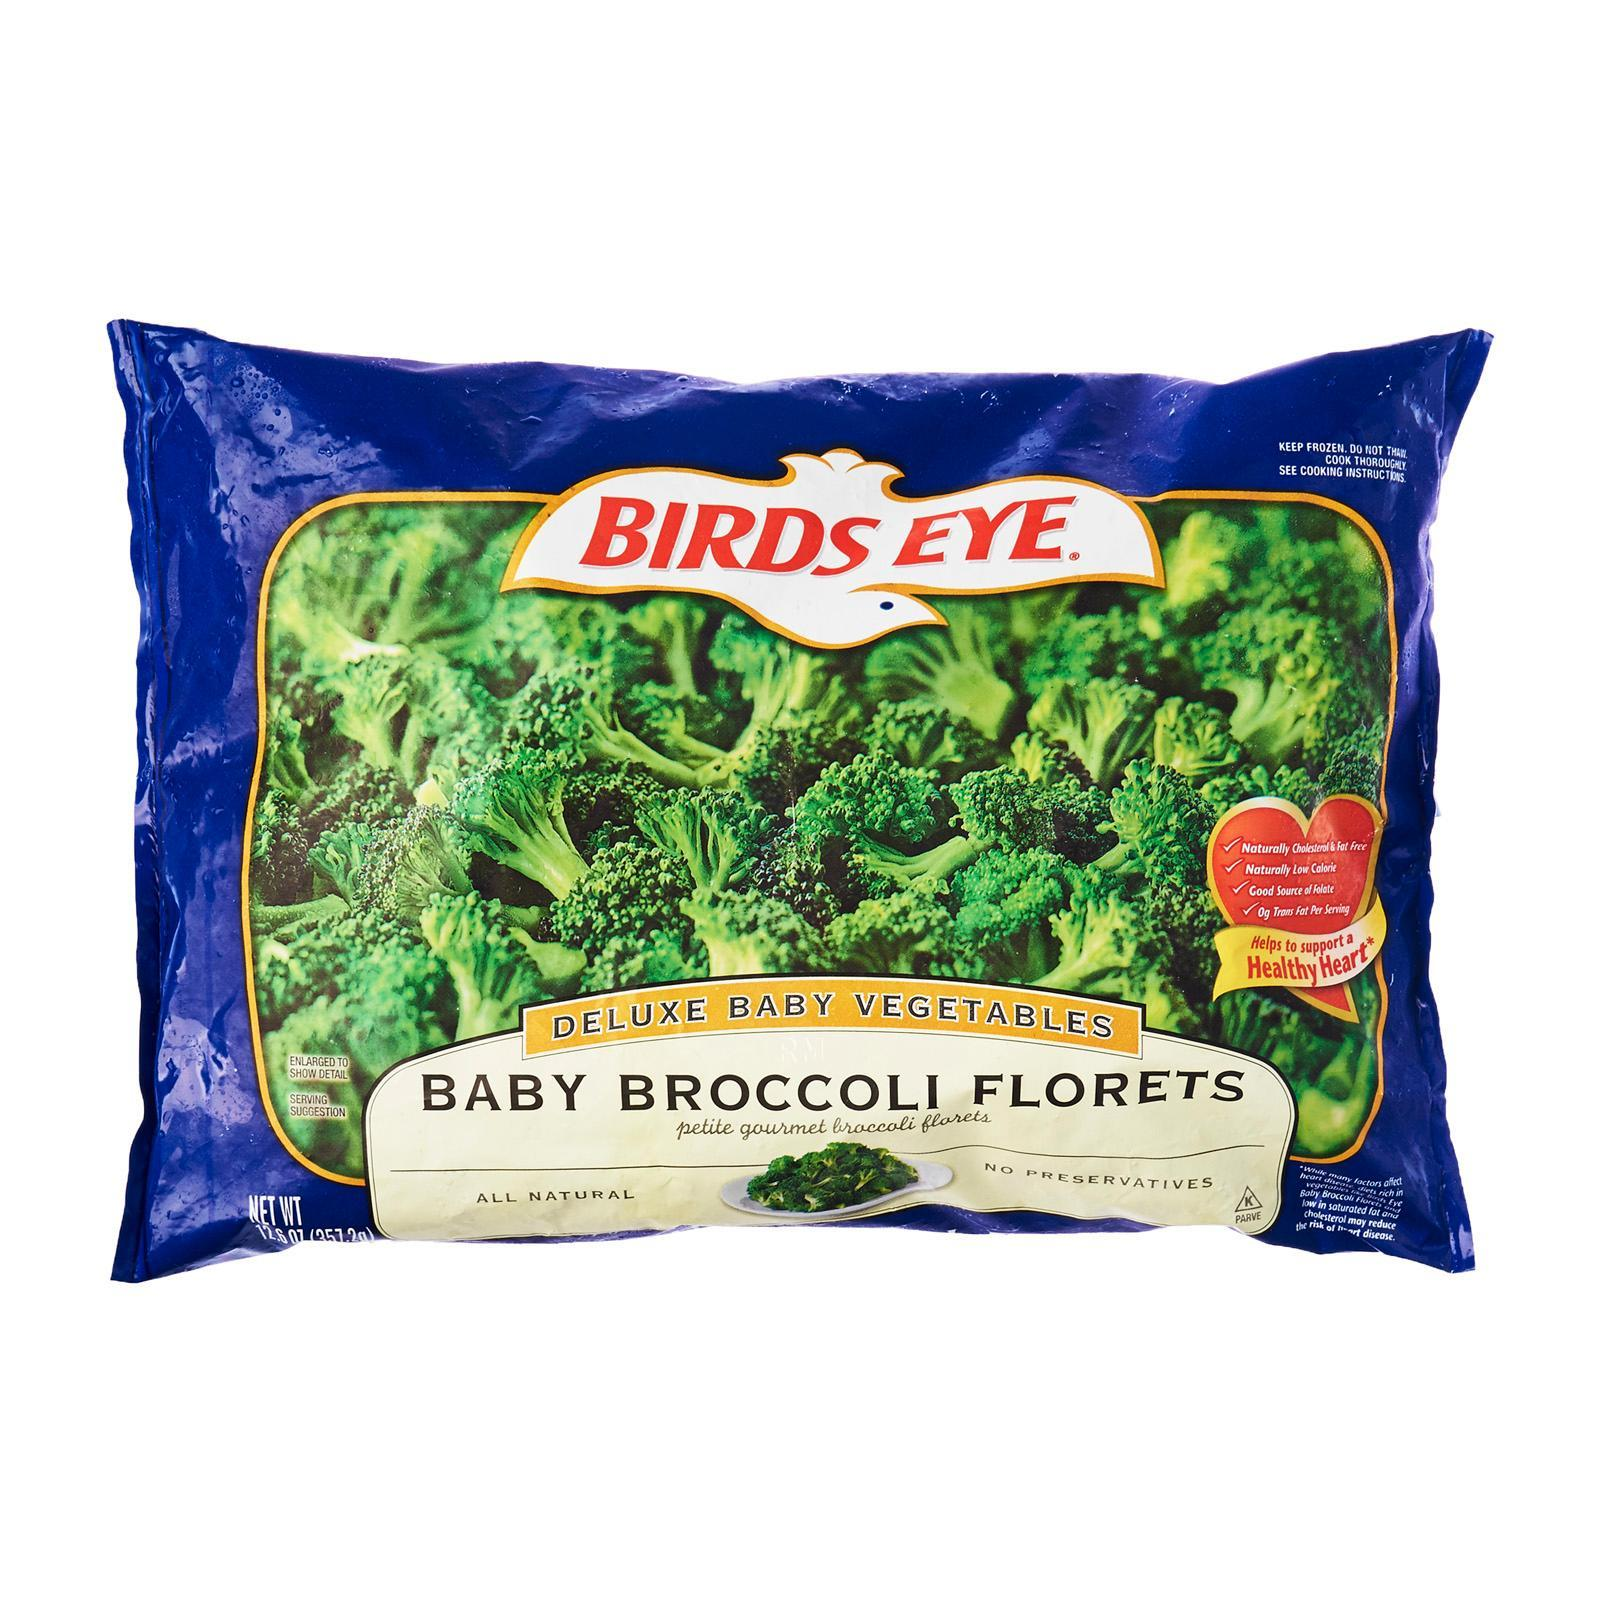 Birds Eye Fresh Frozen Select Deluxe Baby Broccoli Florets - Frozen